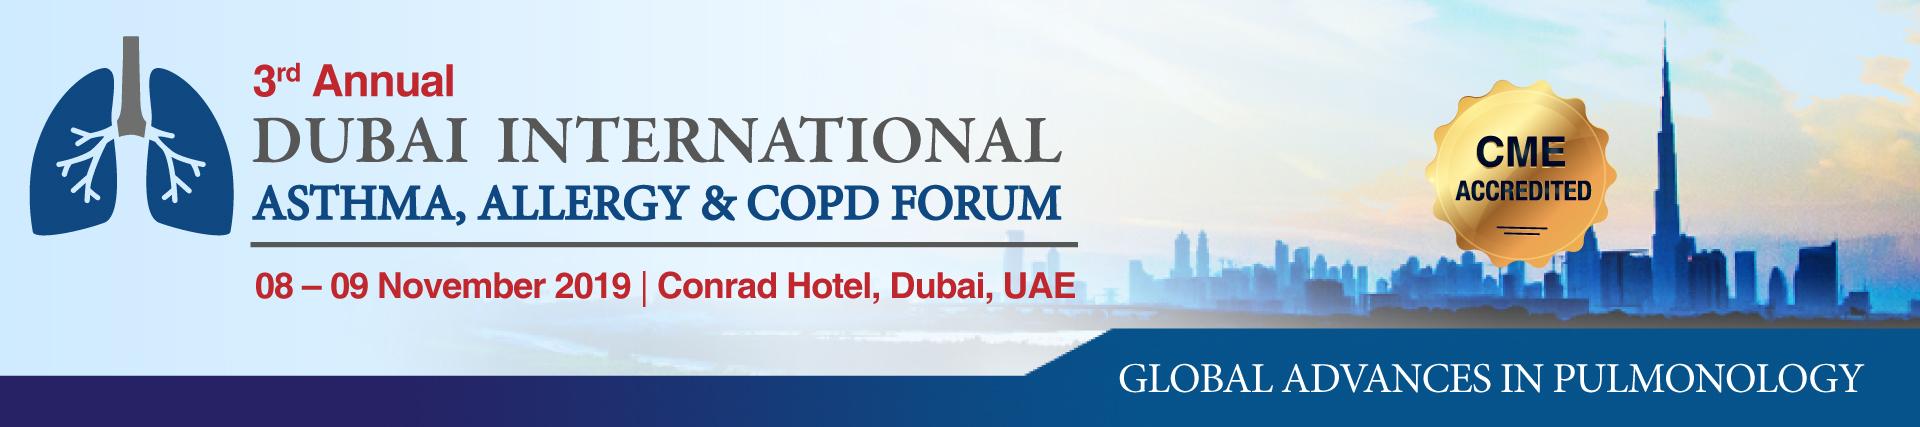 Dubai International Asthma, Allergy and COPD Forum Abstract